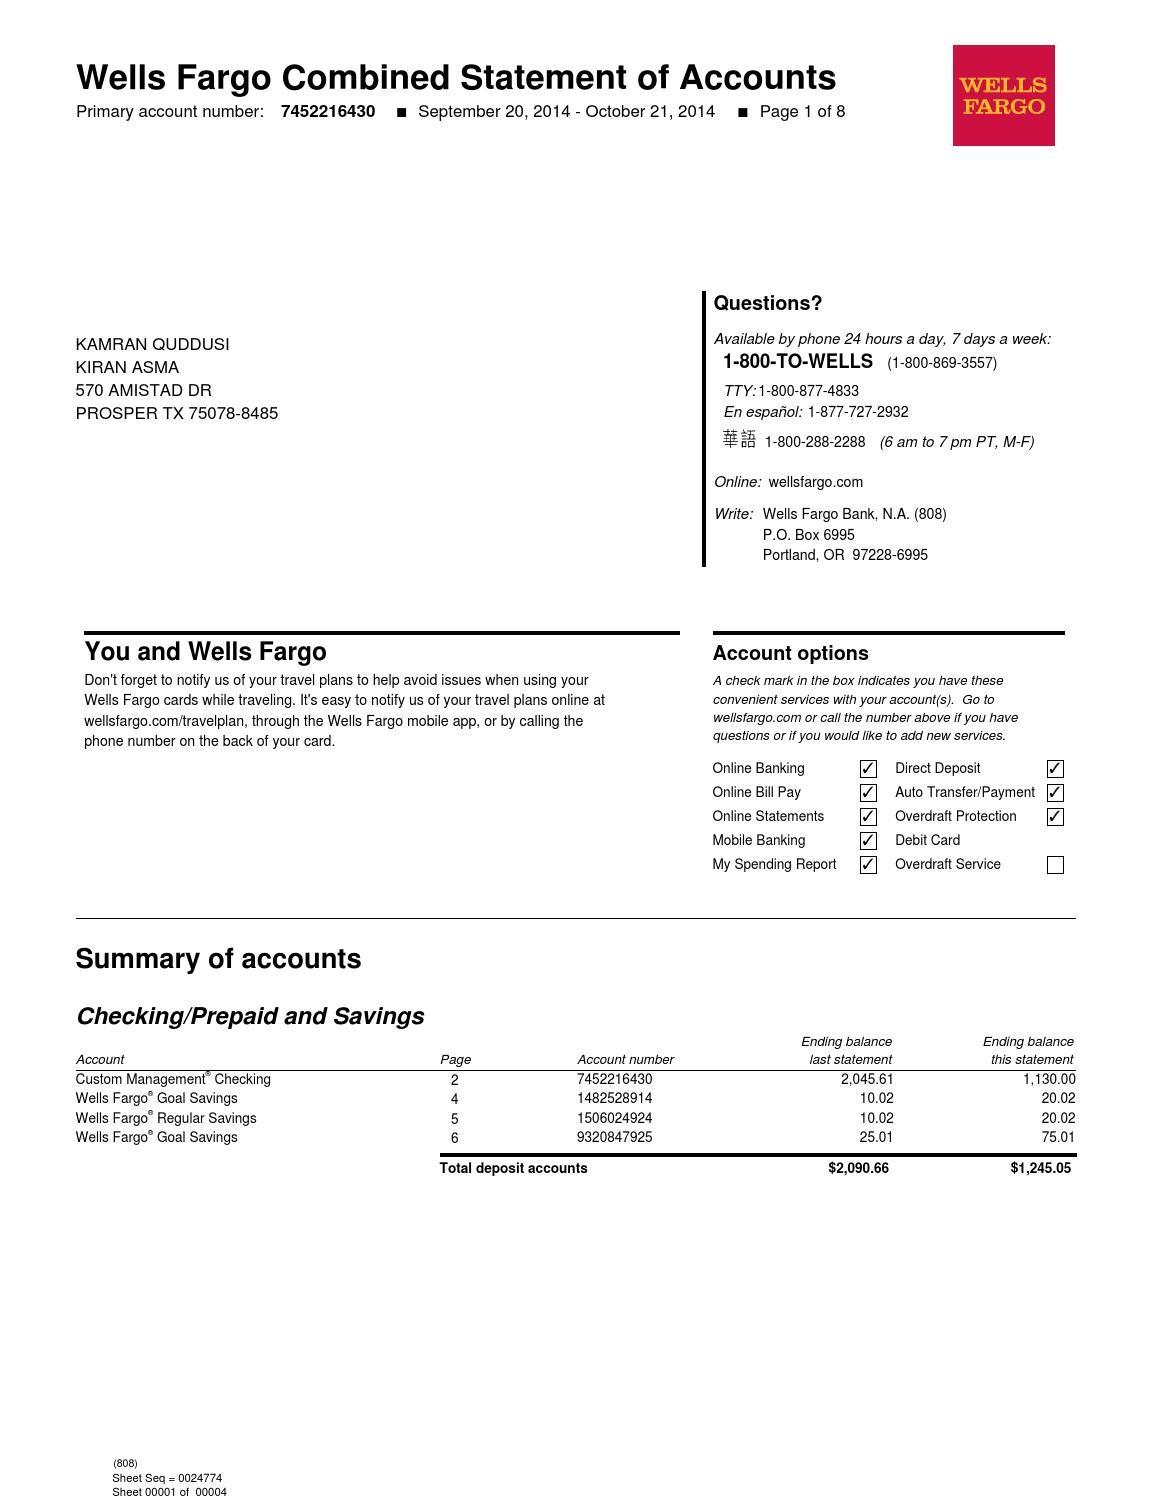 bank statement wells fargo app  Bank statement by tanayaasolole - Issuu - bank statement wells fargo app